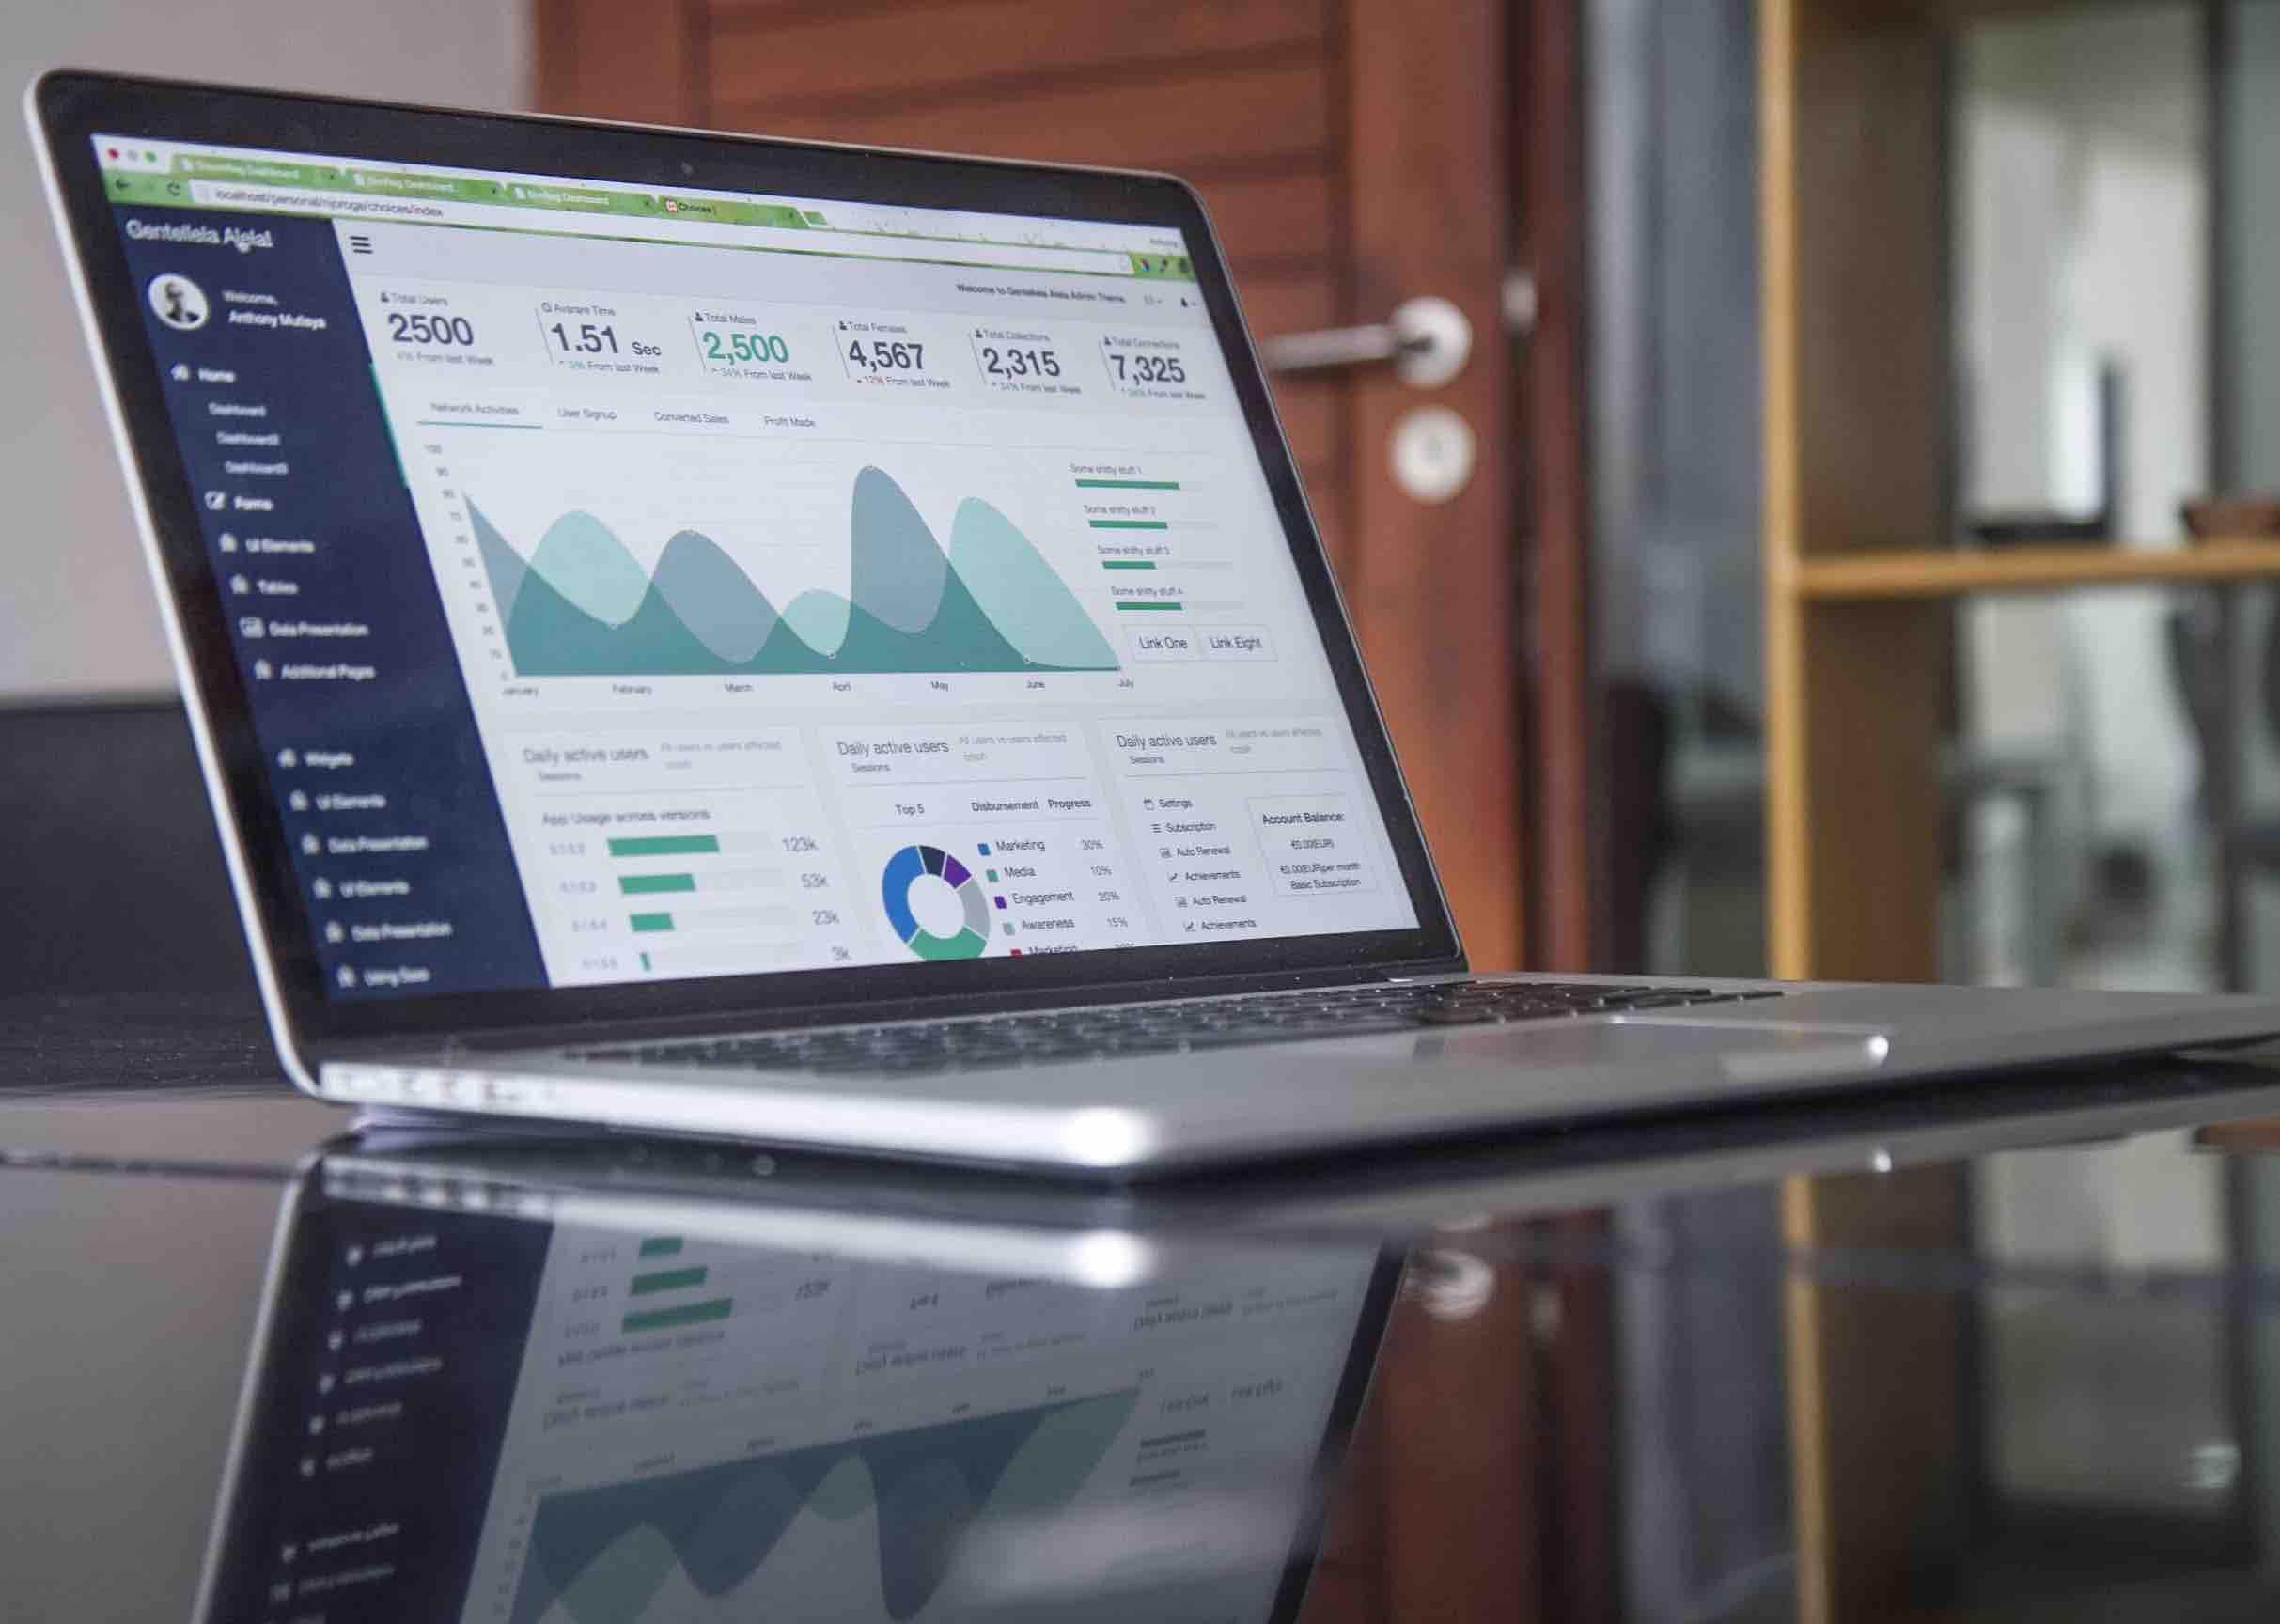 OKR software on a laptop